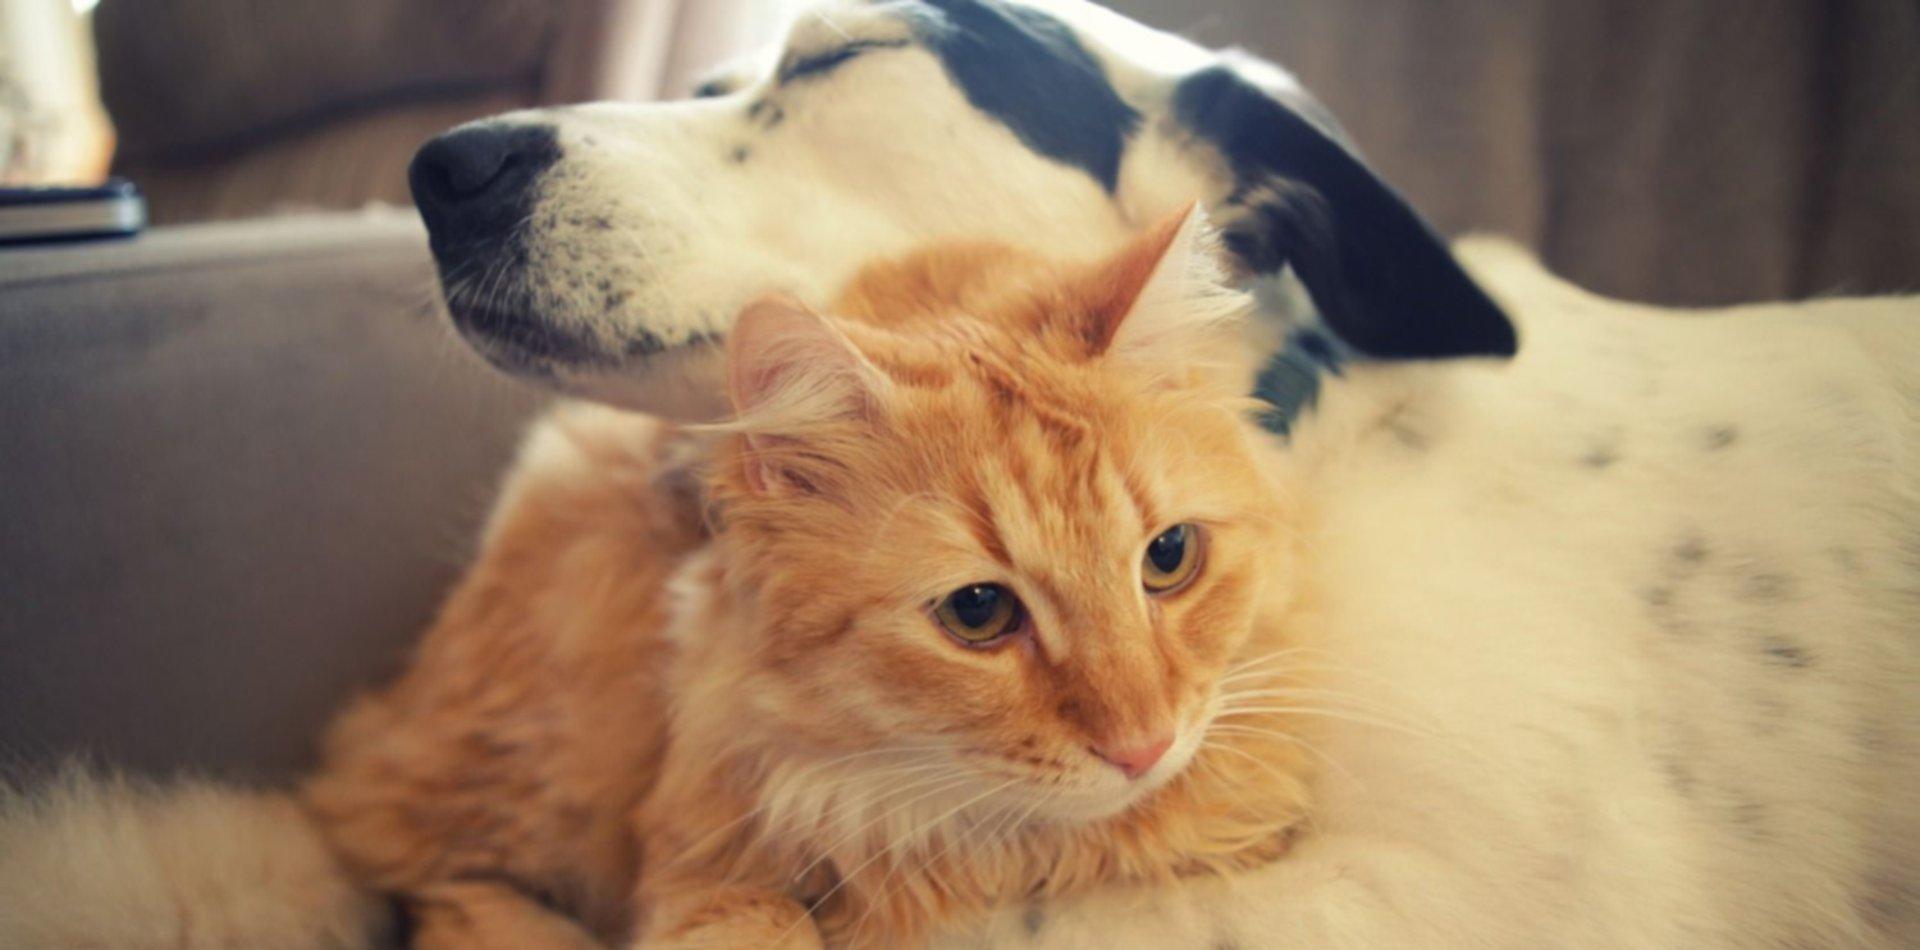 Basta de maltrato animal: La Plata ya tiene al fiscal que va a proteger a todas las mascotas